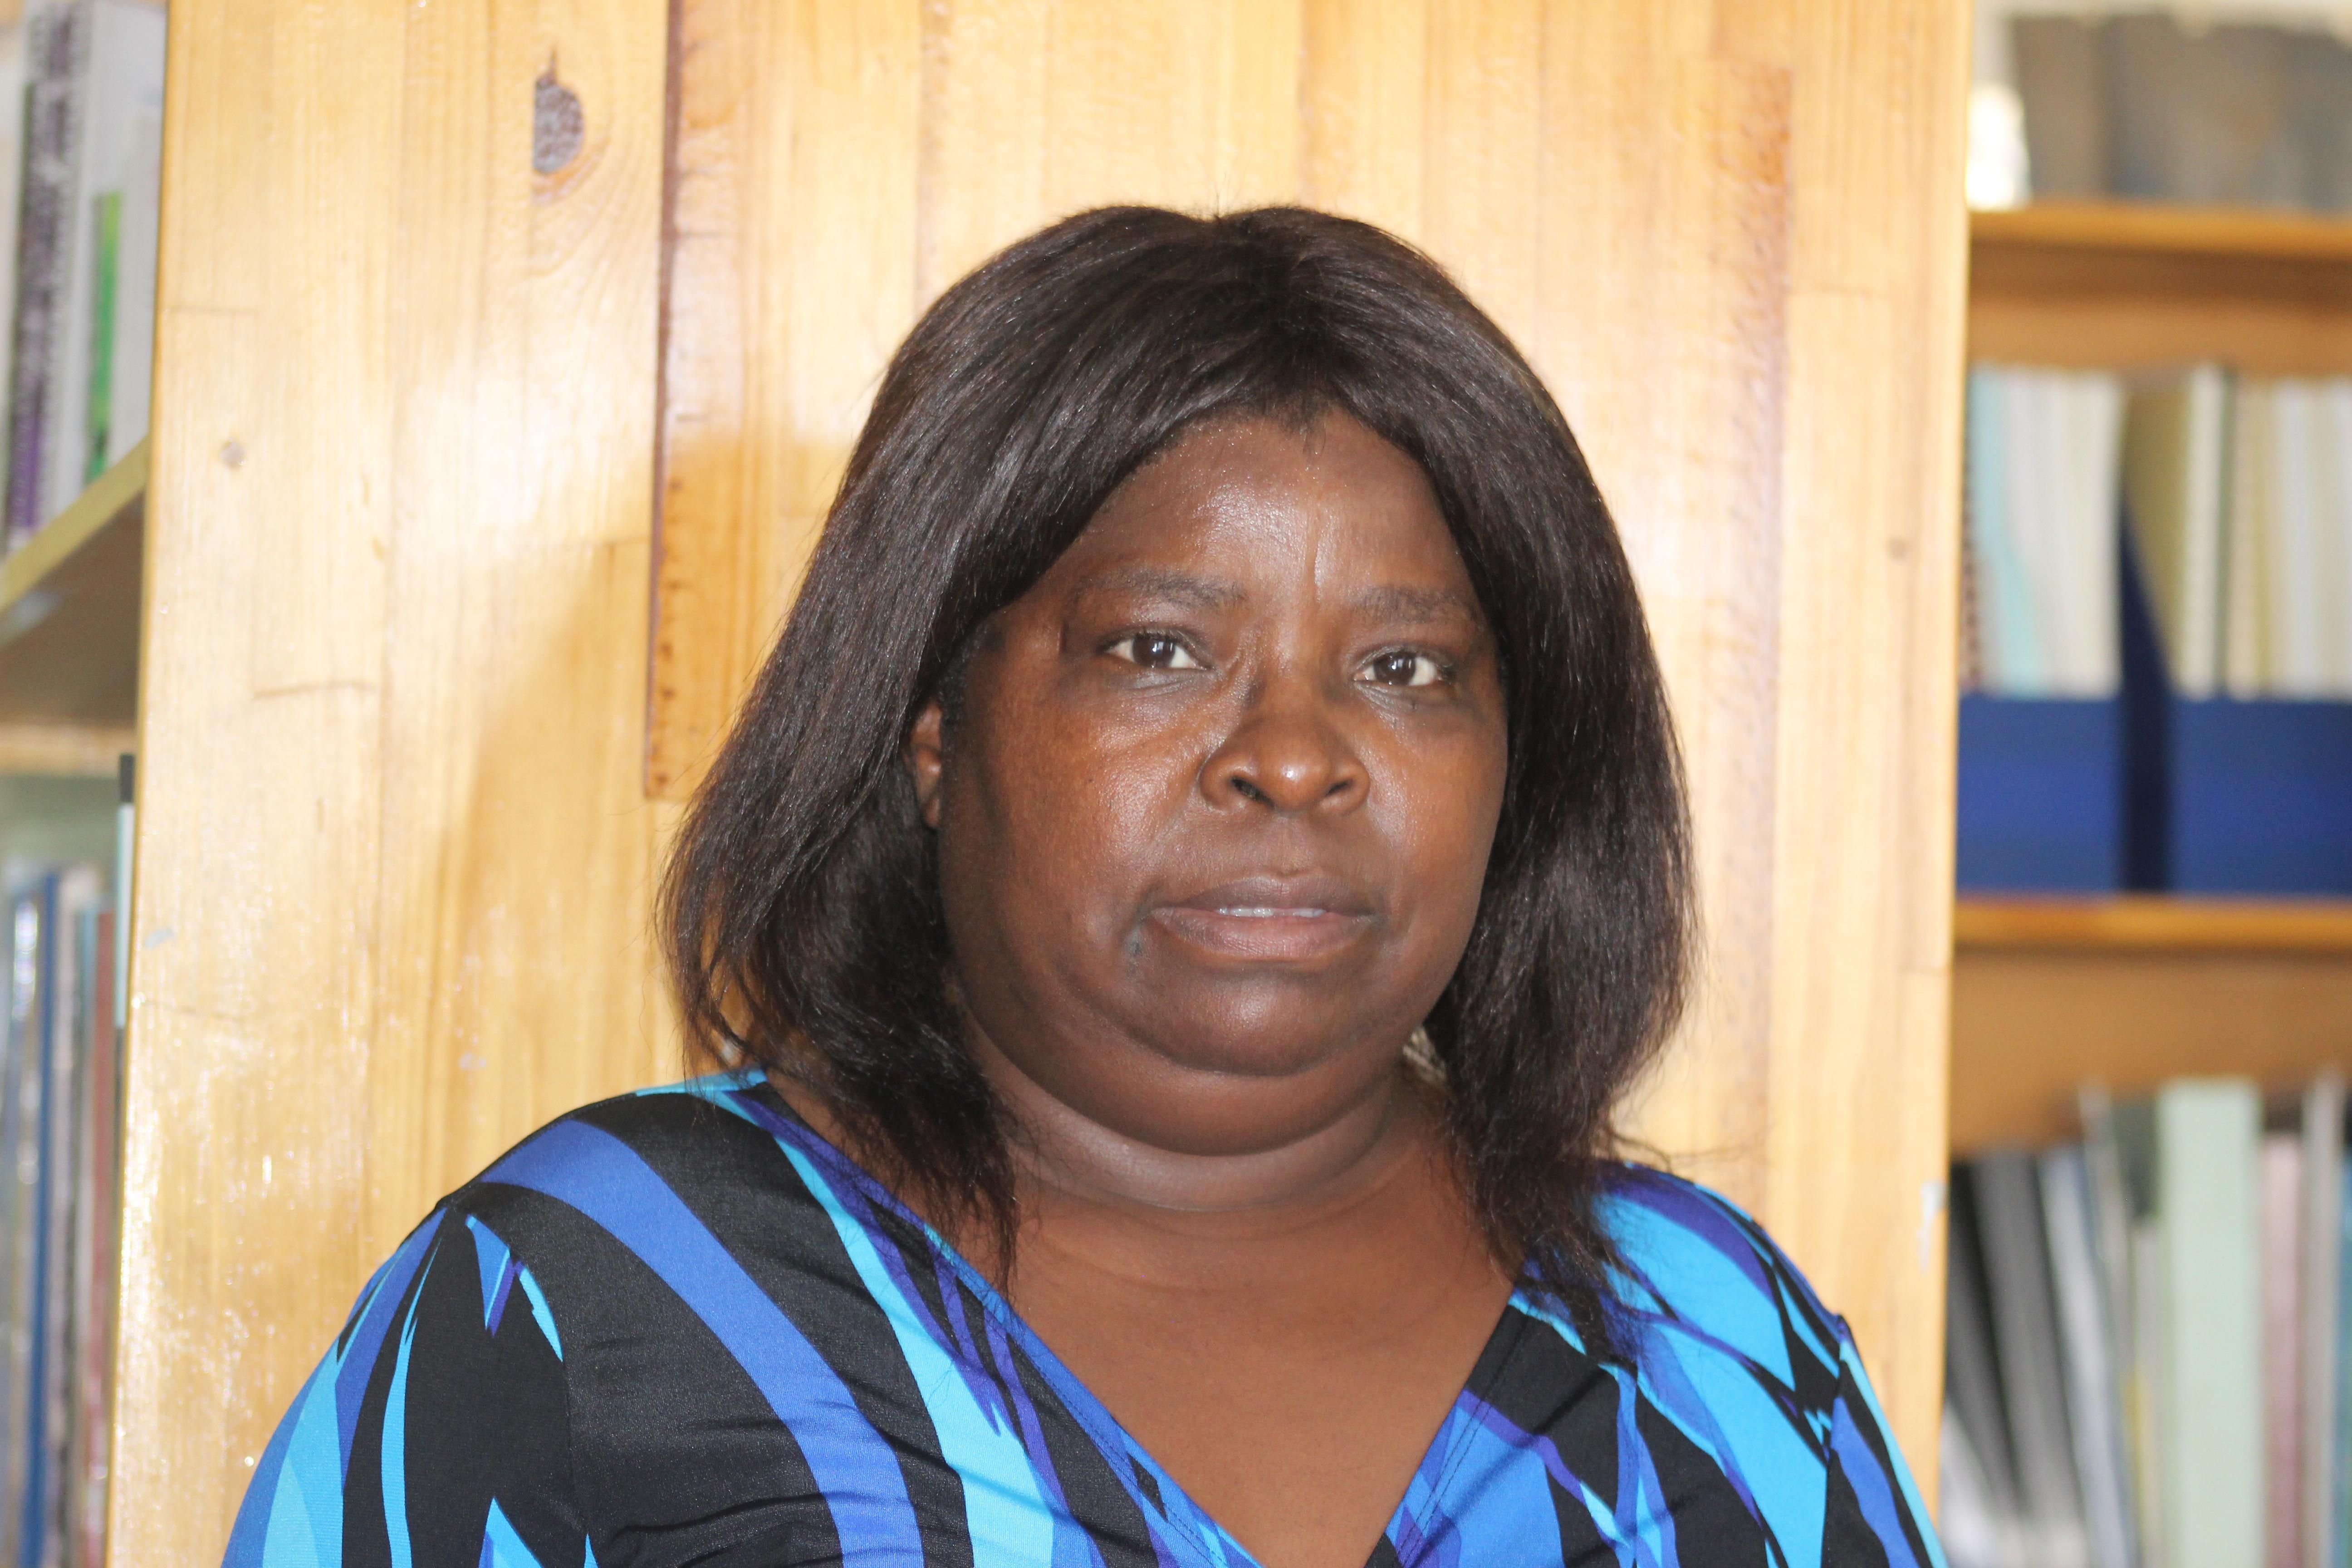 Chilufya Chokwe Siwale